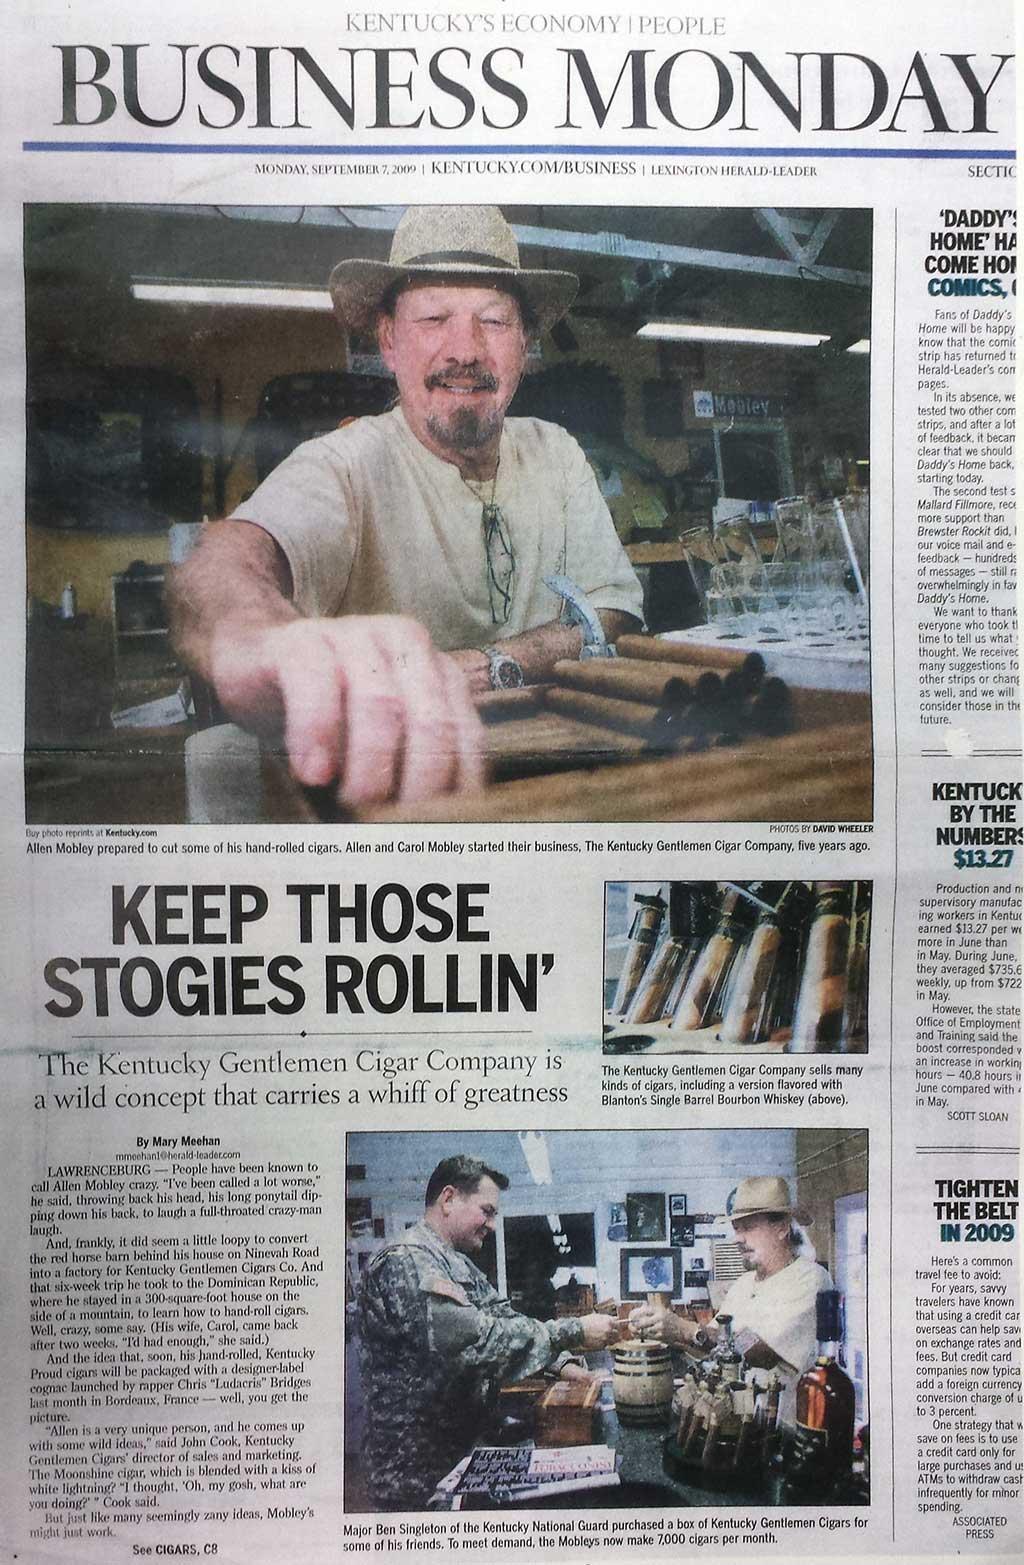 Kentucky Gentleman keeps those stogies rollin'